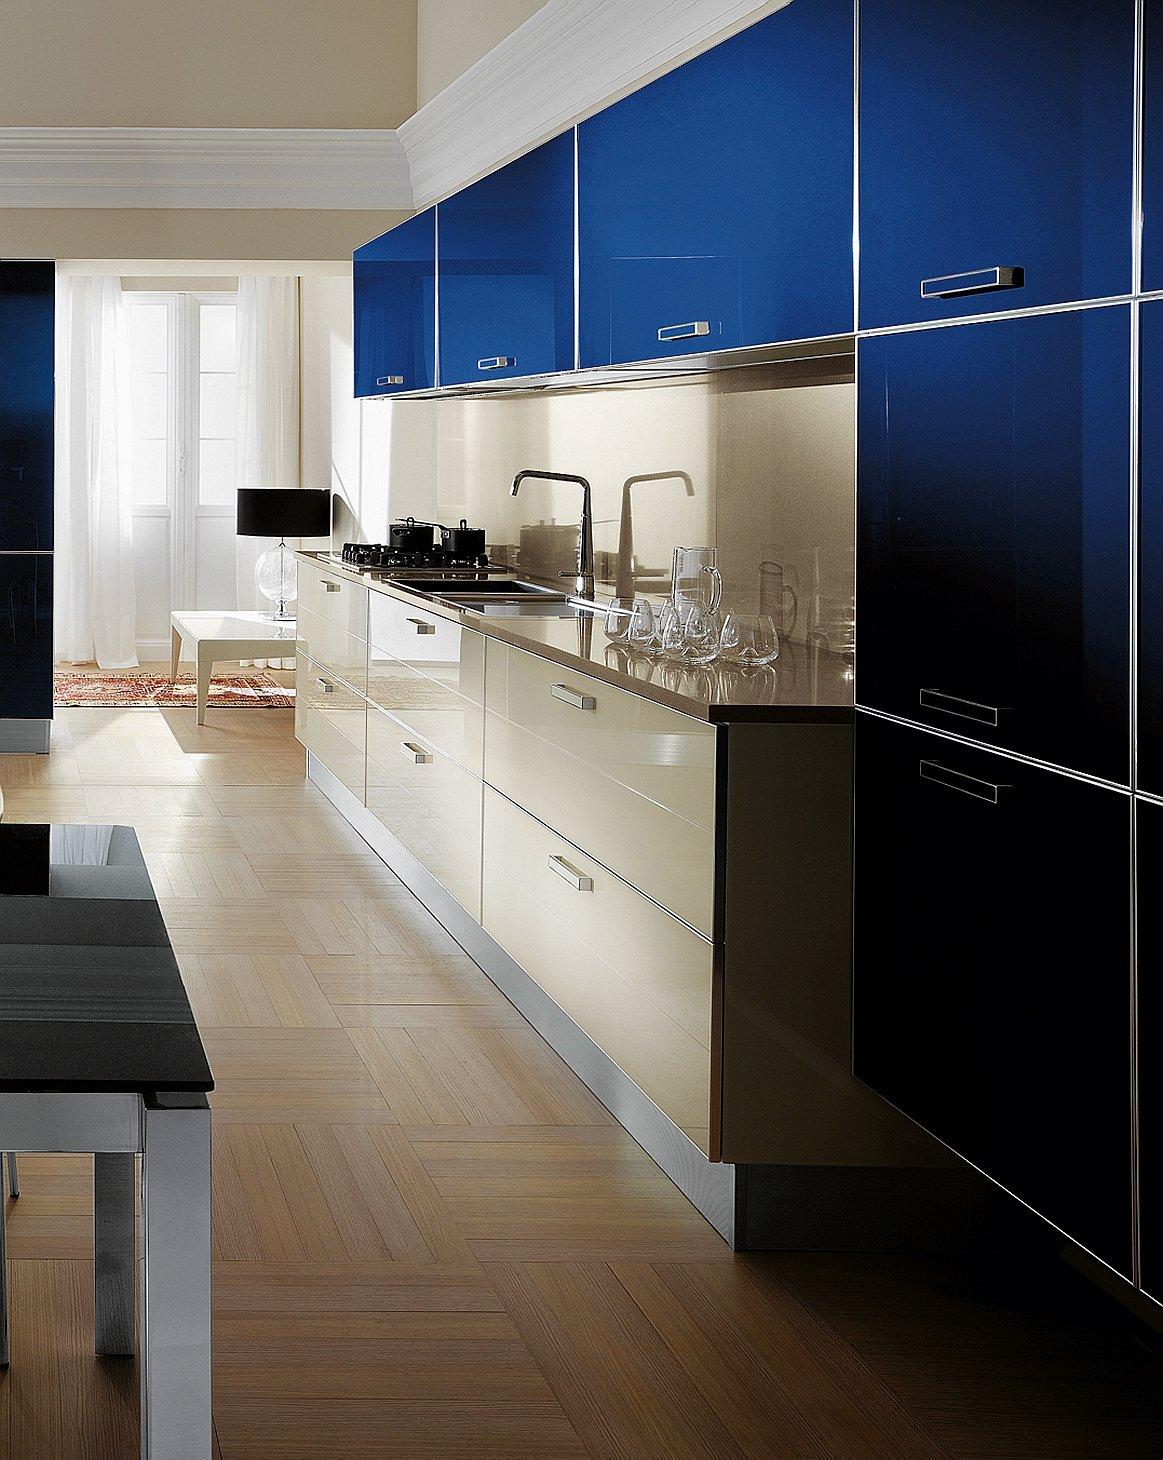 scavolini-crystal-cucina - Cose di Casa